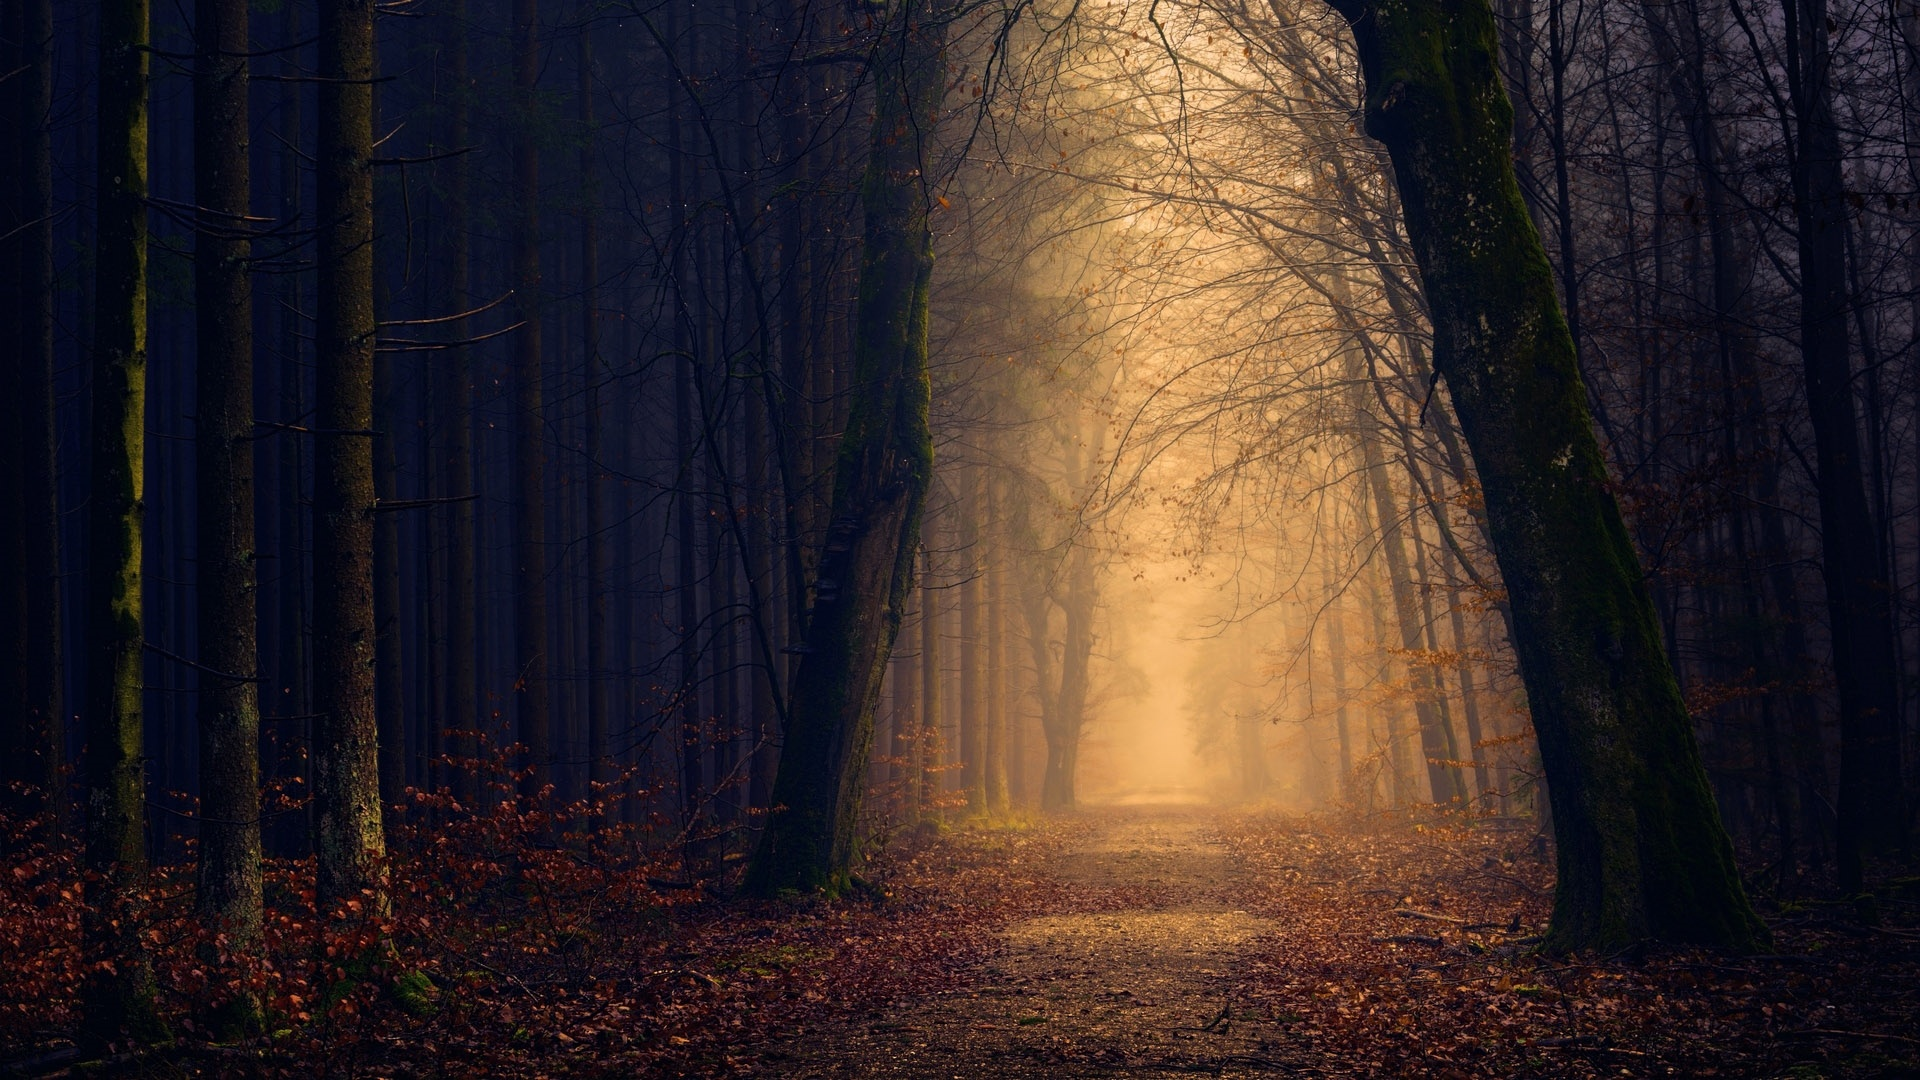 Dark Autumn Image